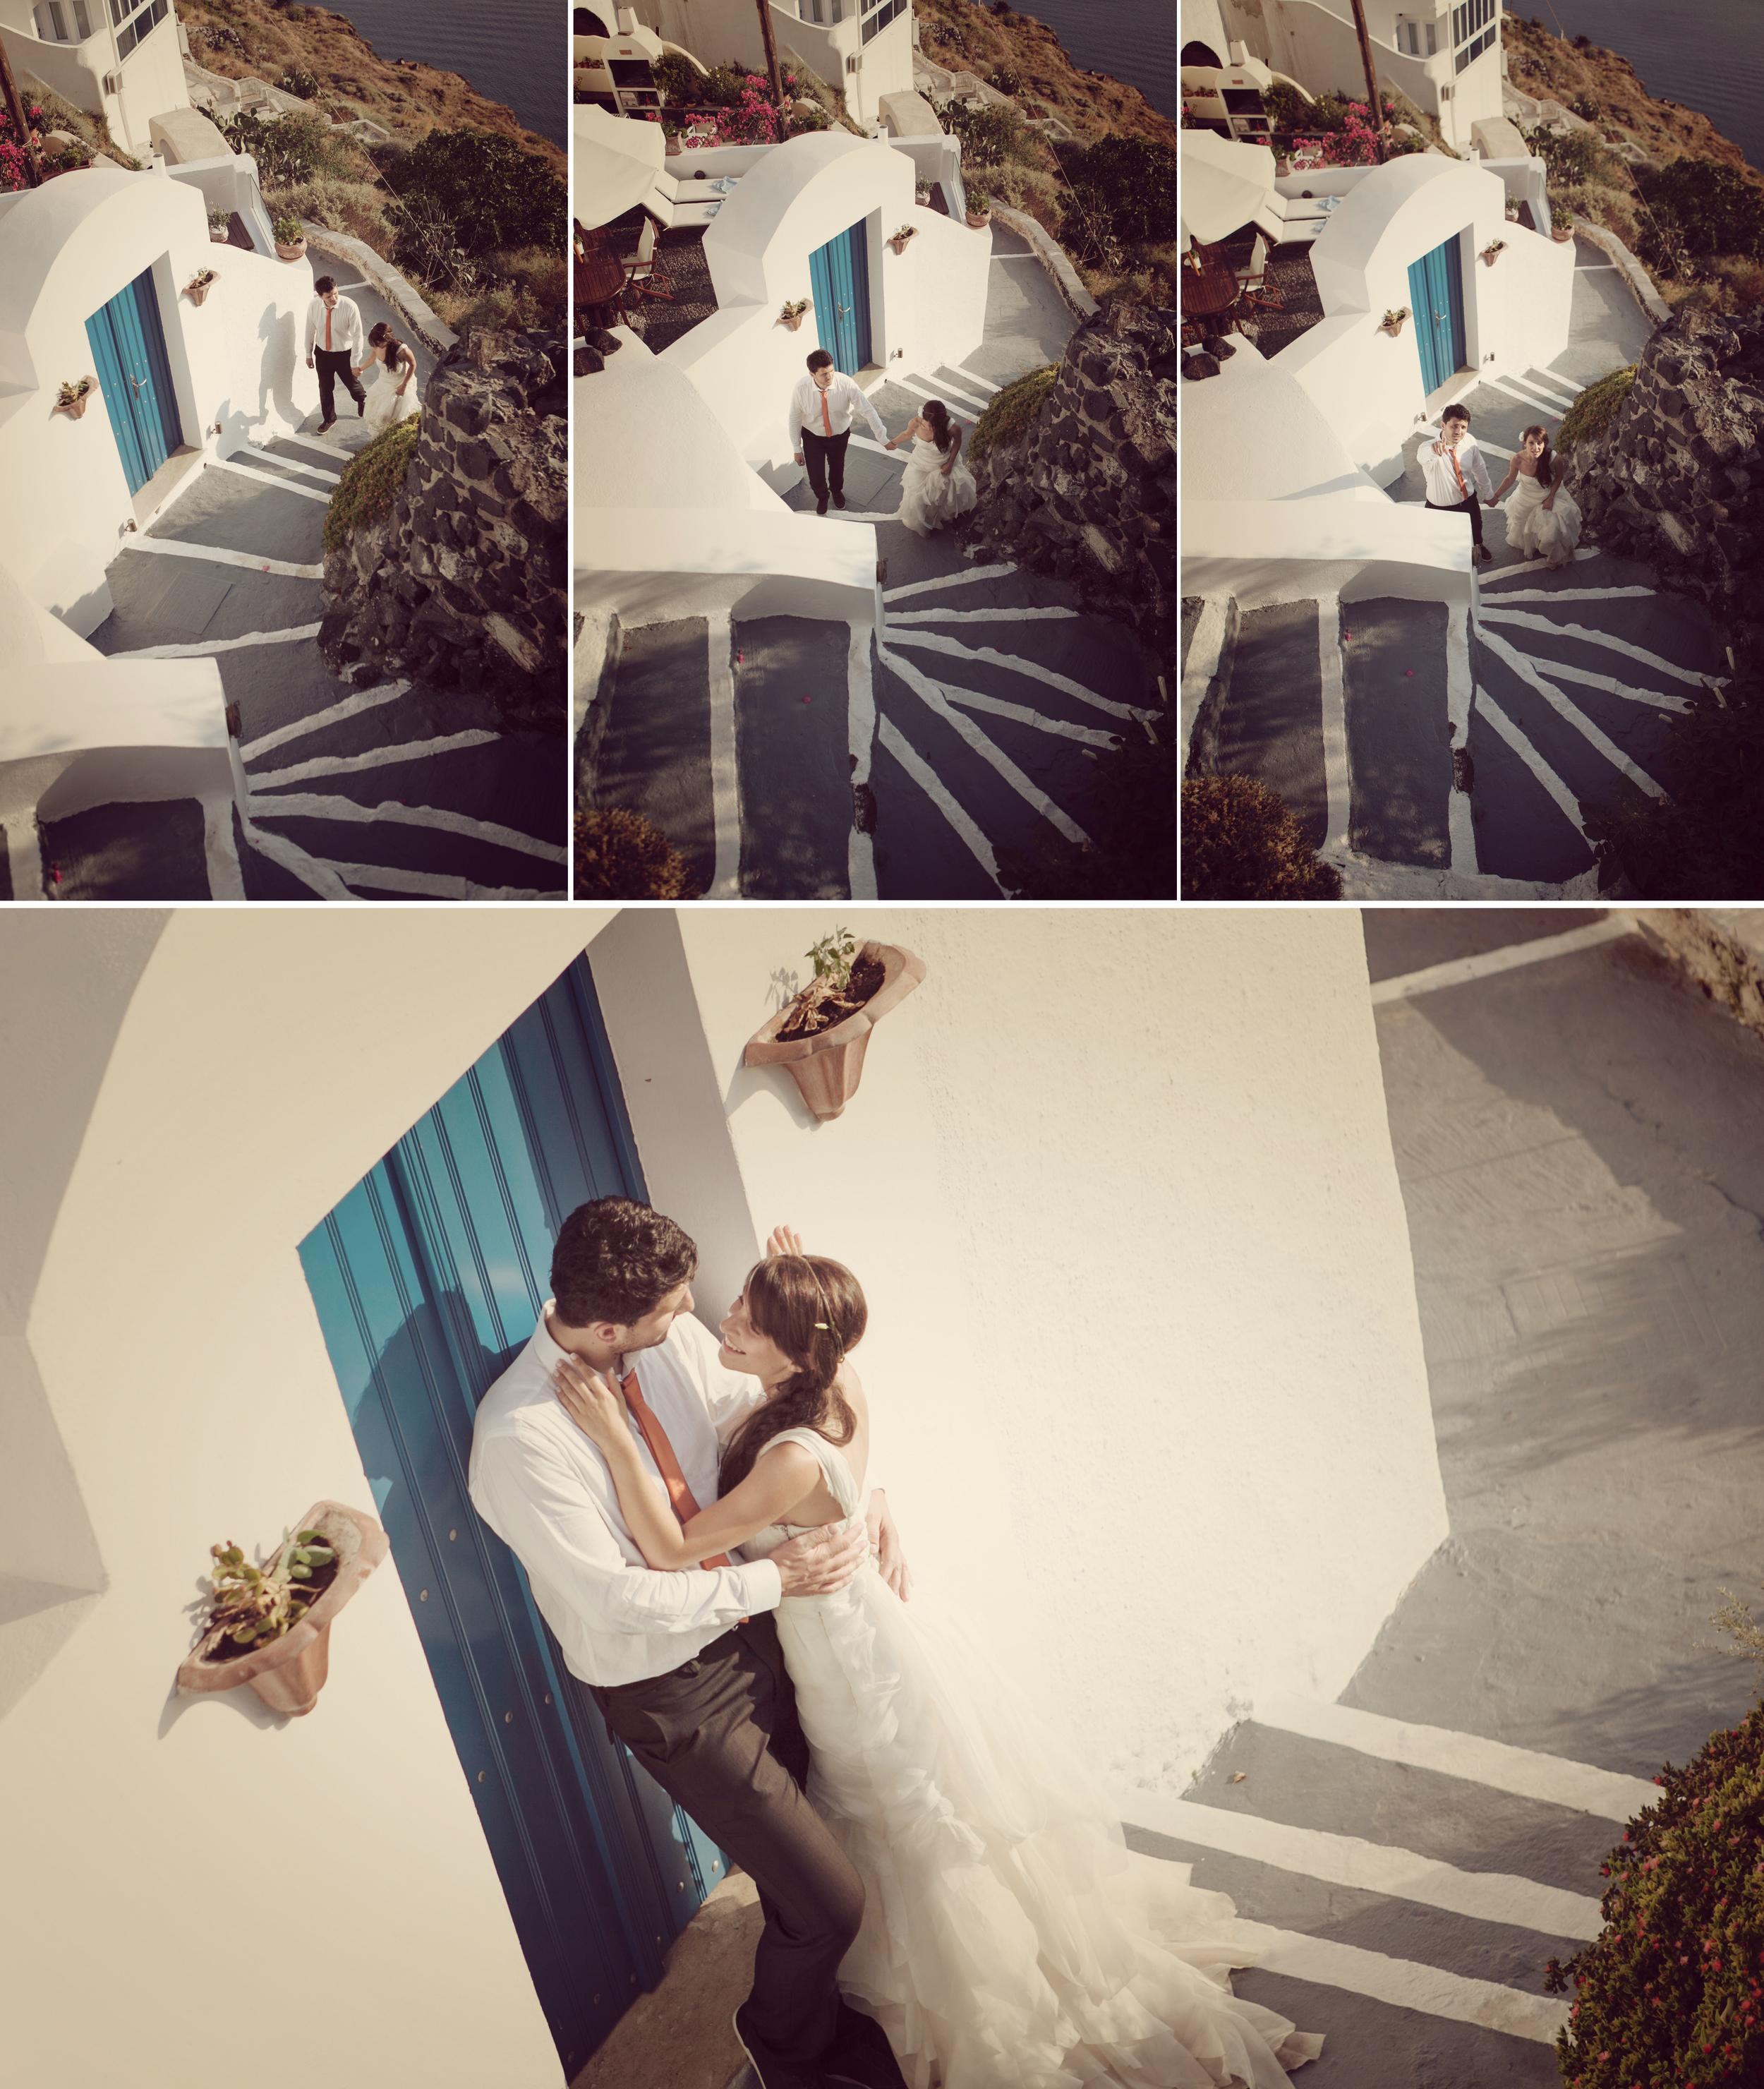 ANDRIOPOULOS WEDDINGS SANTORINI 07.jpg